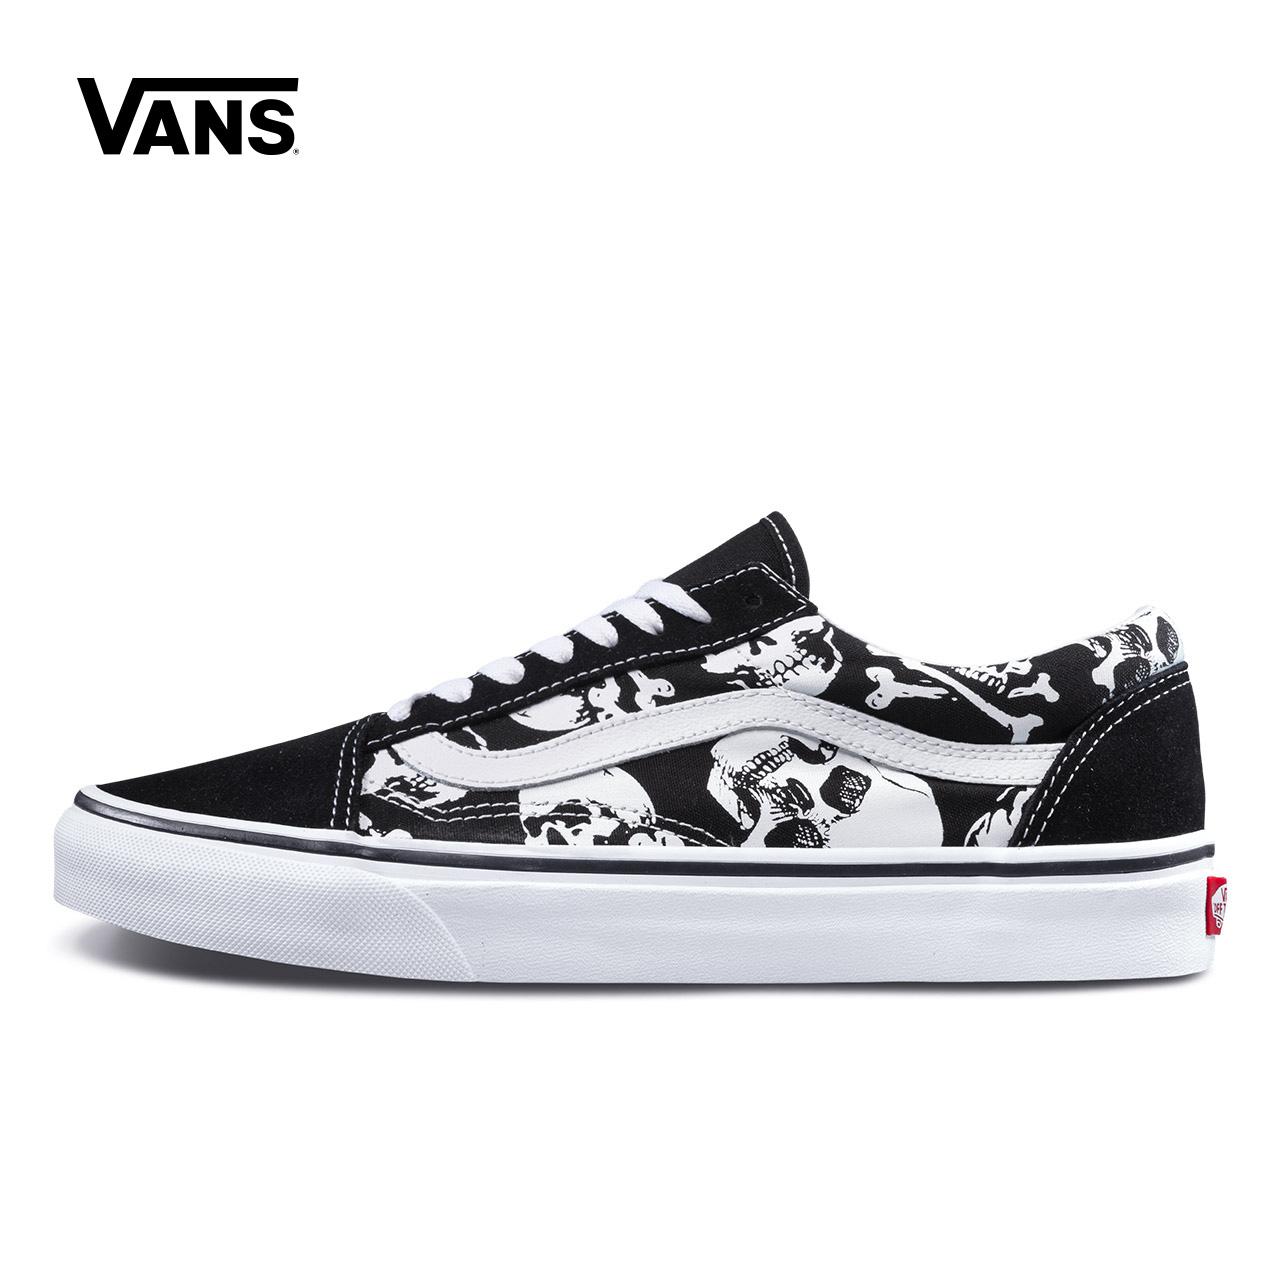 Vans 范斯官方男女款OLD SKOOL板鞋|VN0A38G1H0B